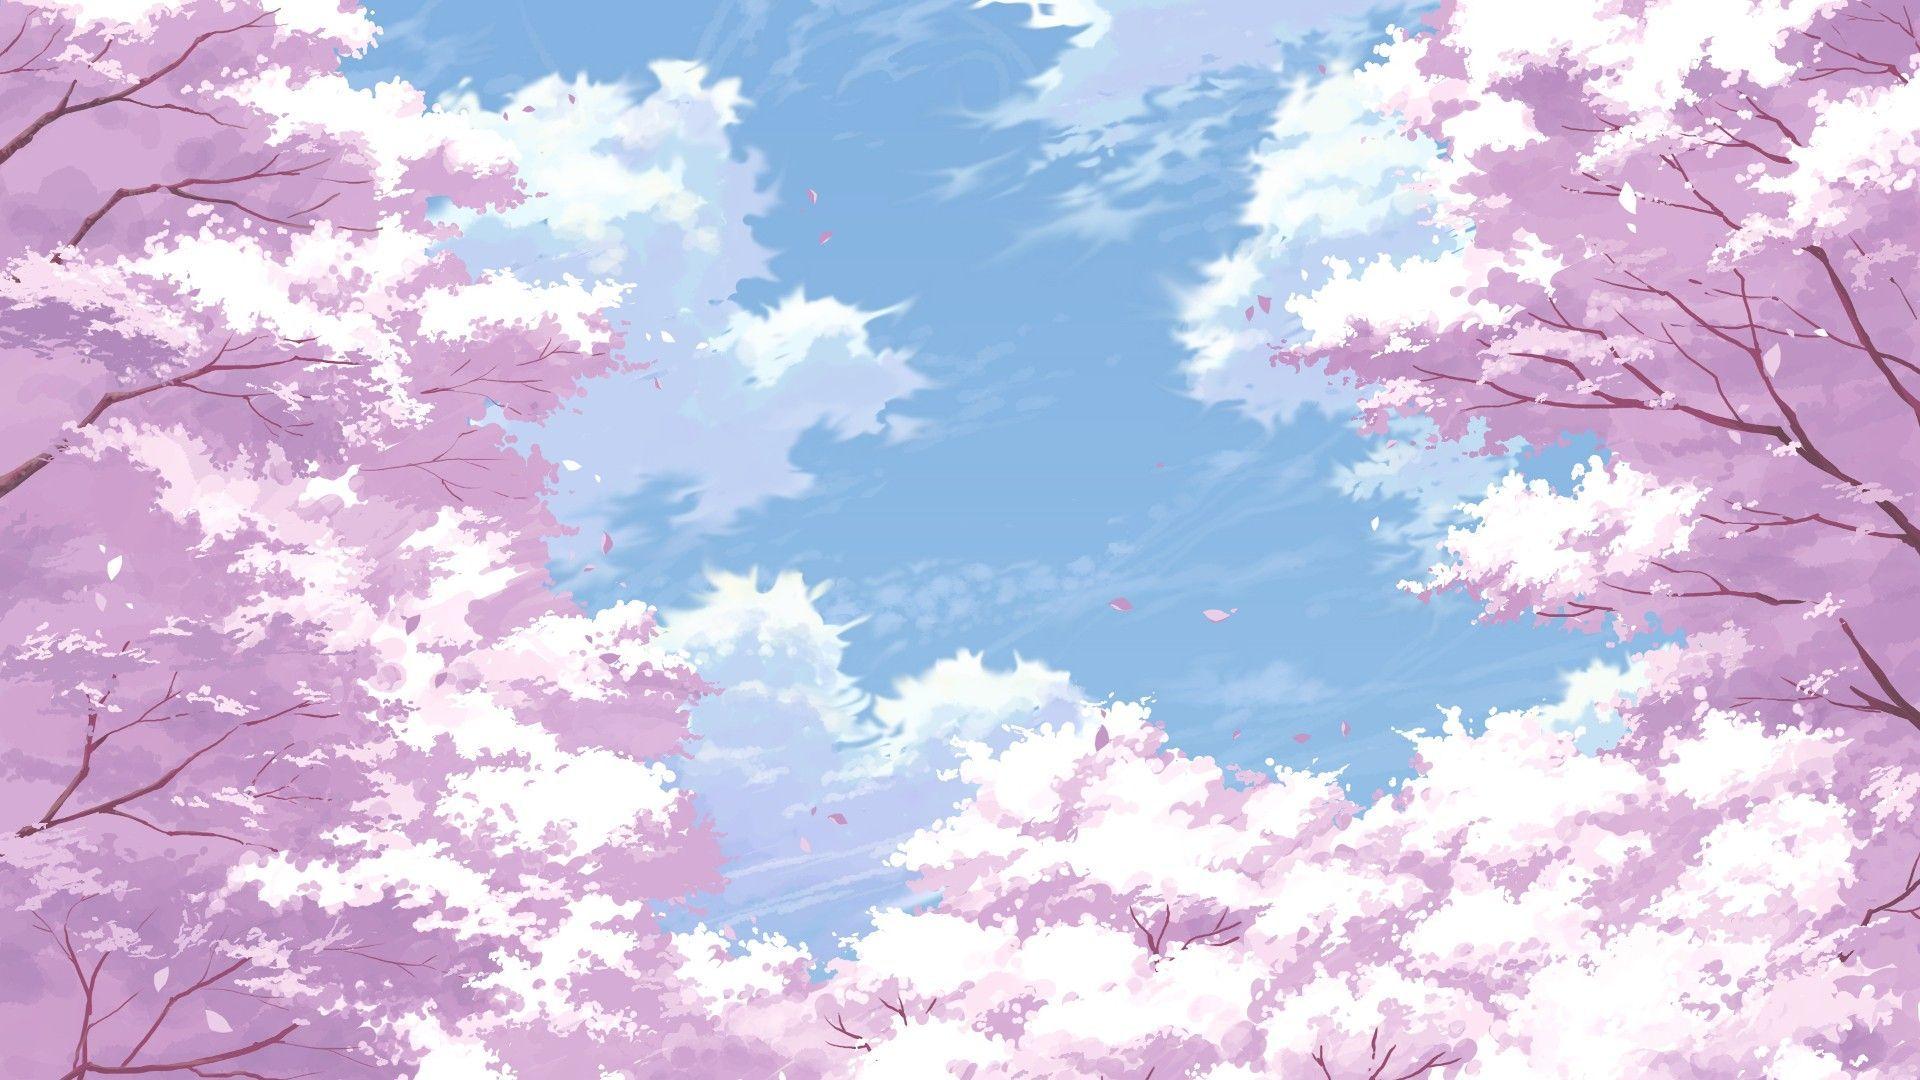 Anime Cherry Blossom Google Search Anime Cherry Blossom Anime Scenery Wallpaper Anime Scenery